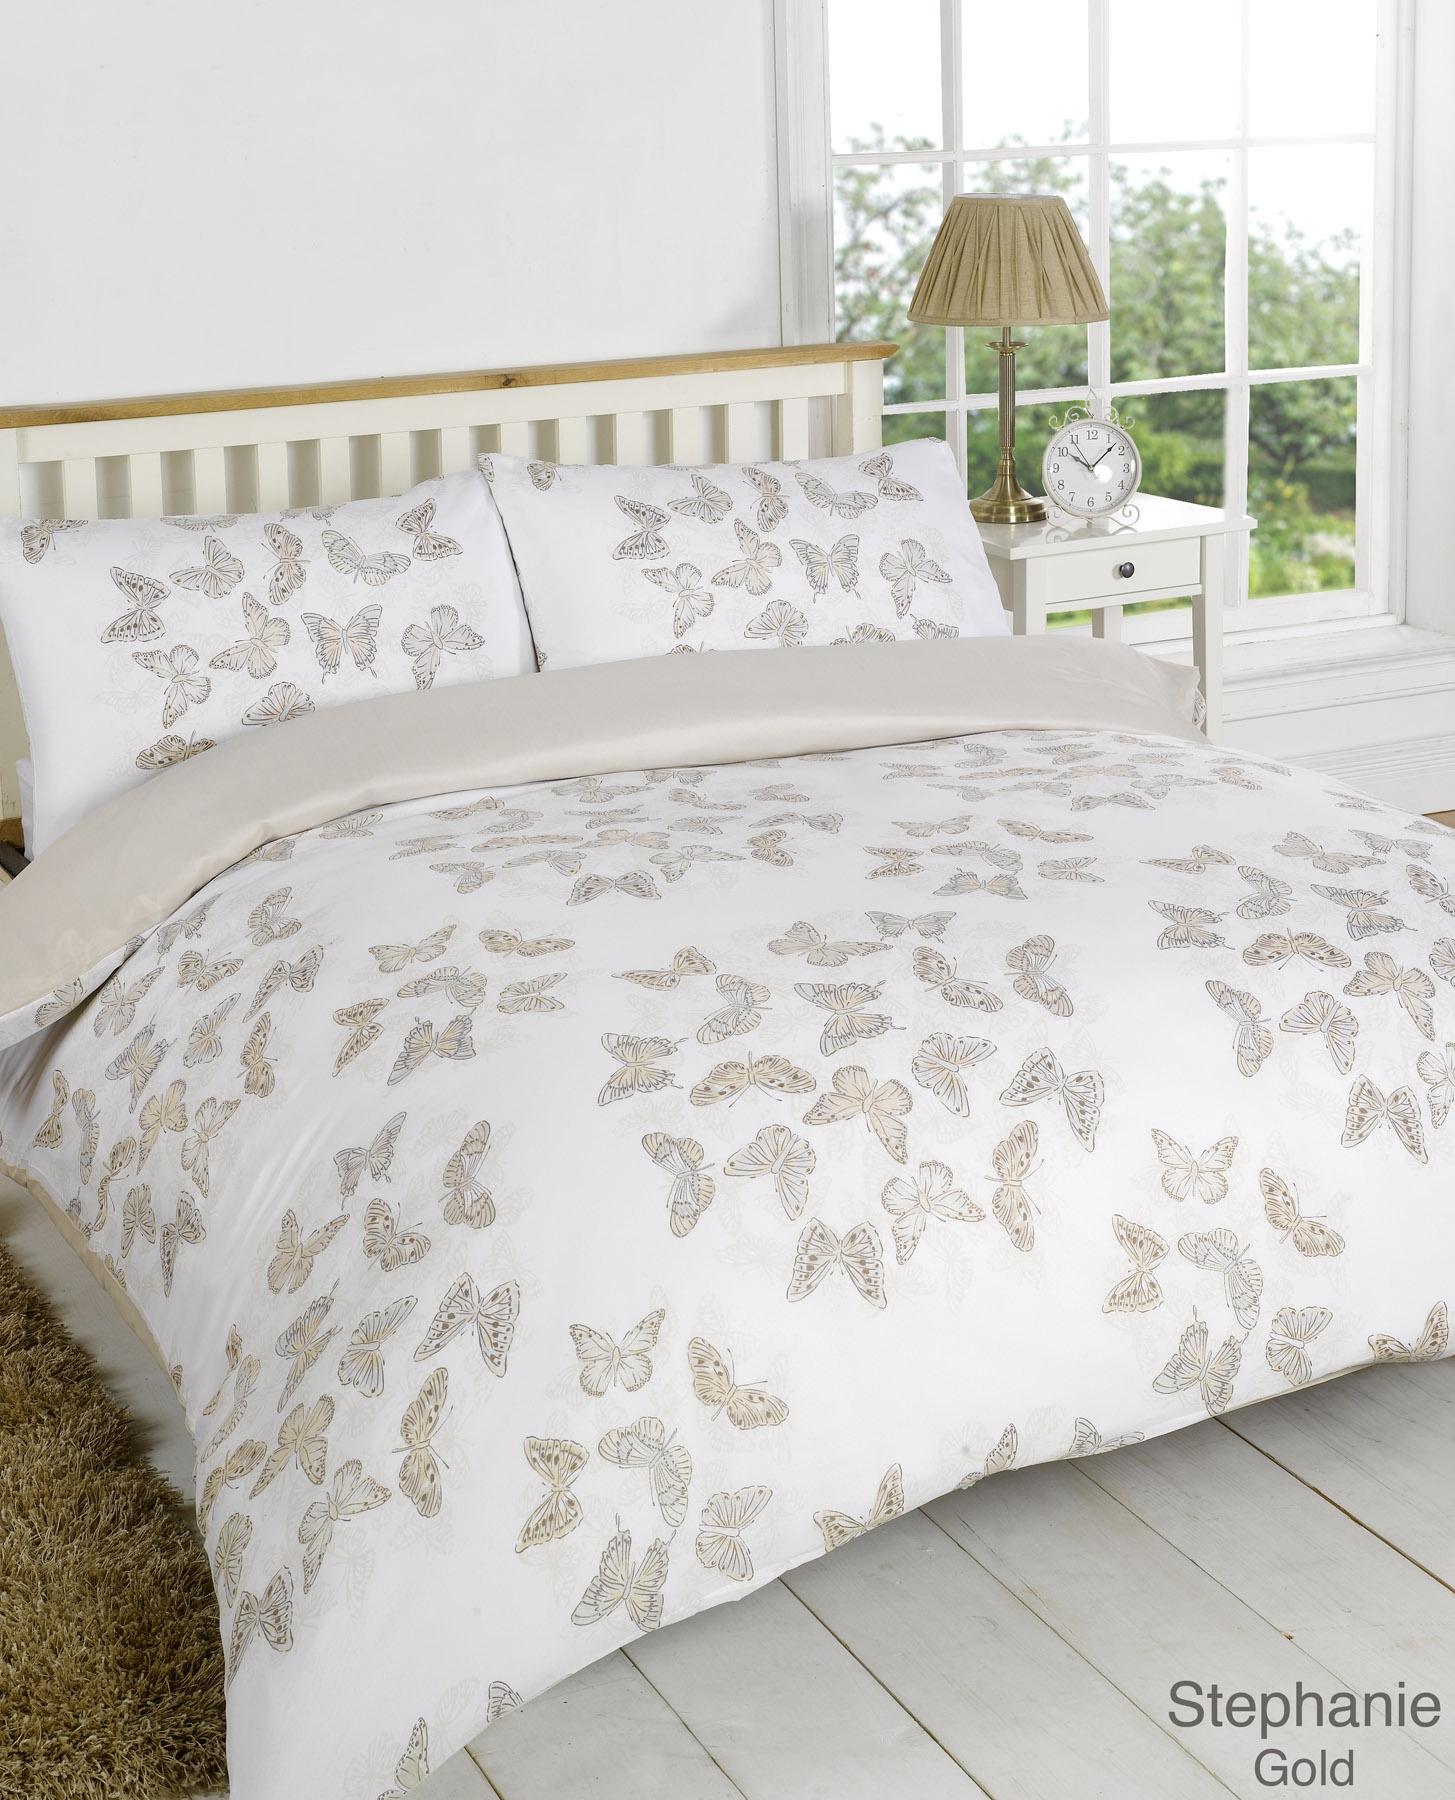 duvet quilt cover bedding set all colours single double king size superking size ebay. Black Bedroom Furniture Sets. Home Design Ideas